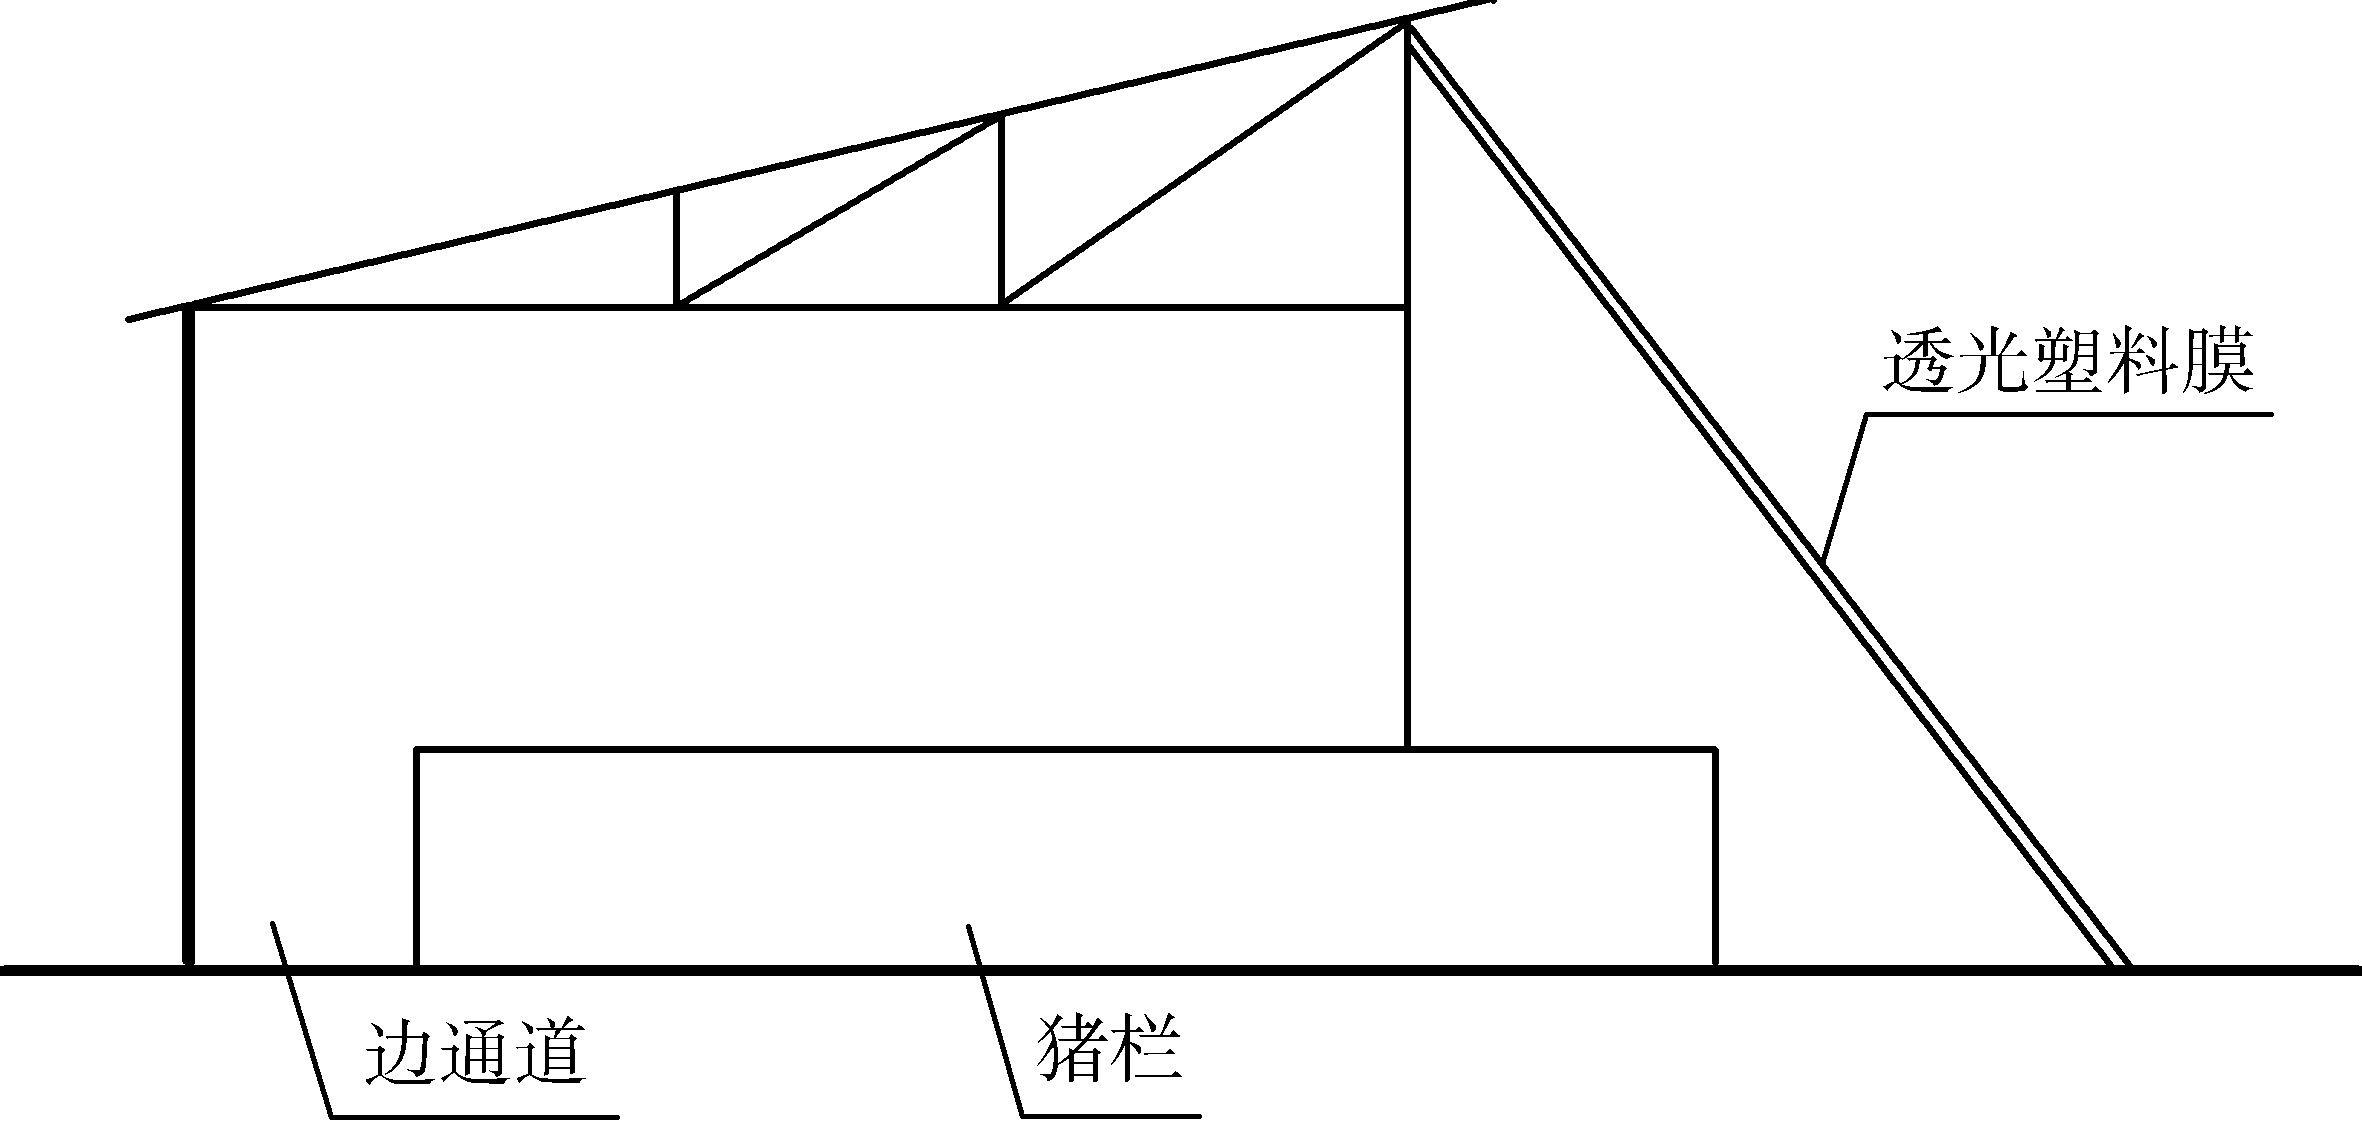 设计图 2362_1138